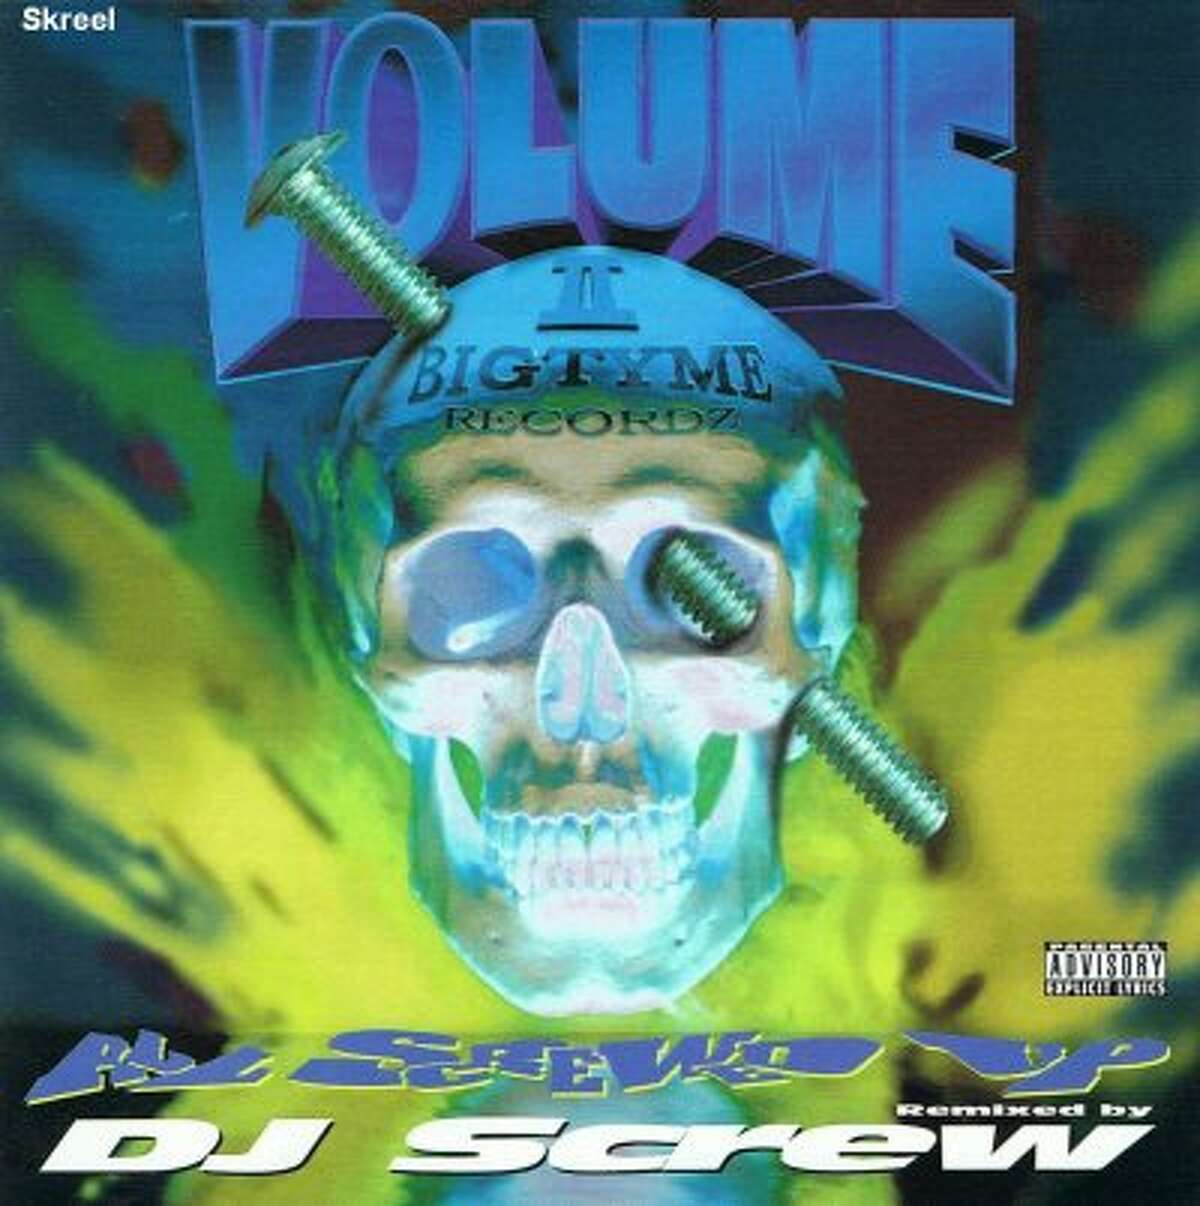 "Bigtyme Recordz - ""Vol. 2 - All messed up."" 1995, Bigtyme Recordz, Houston, Texas"